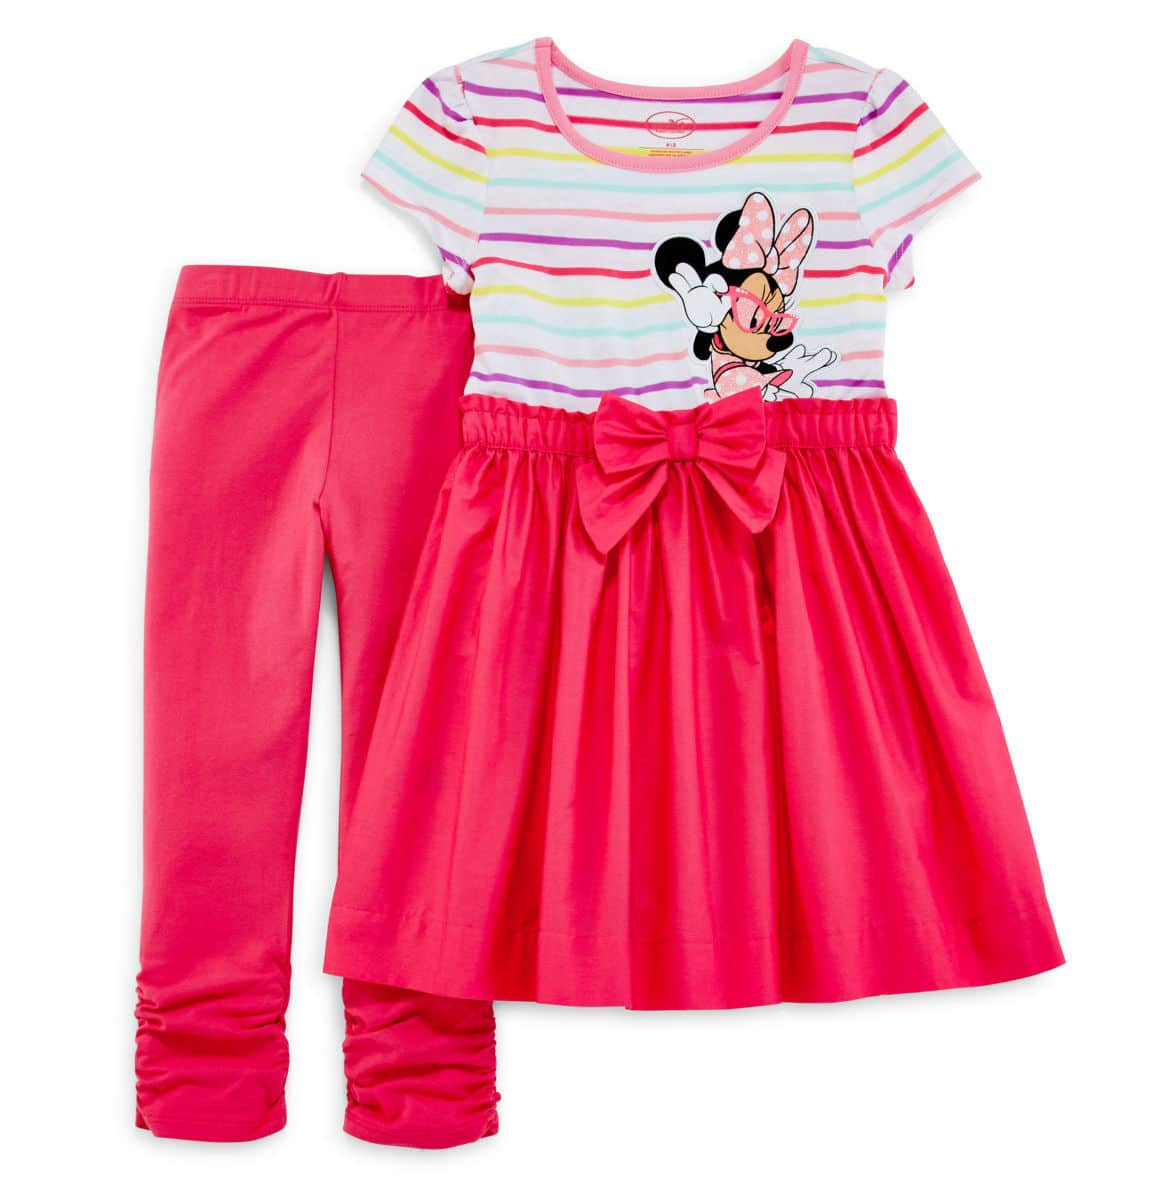 Latest Minnie Mouse Clothes Design